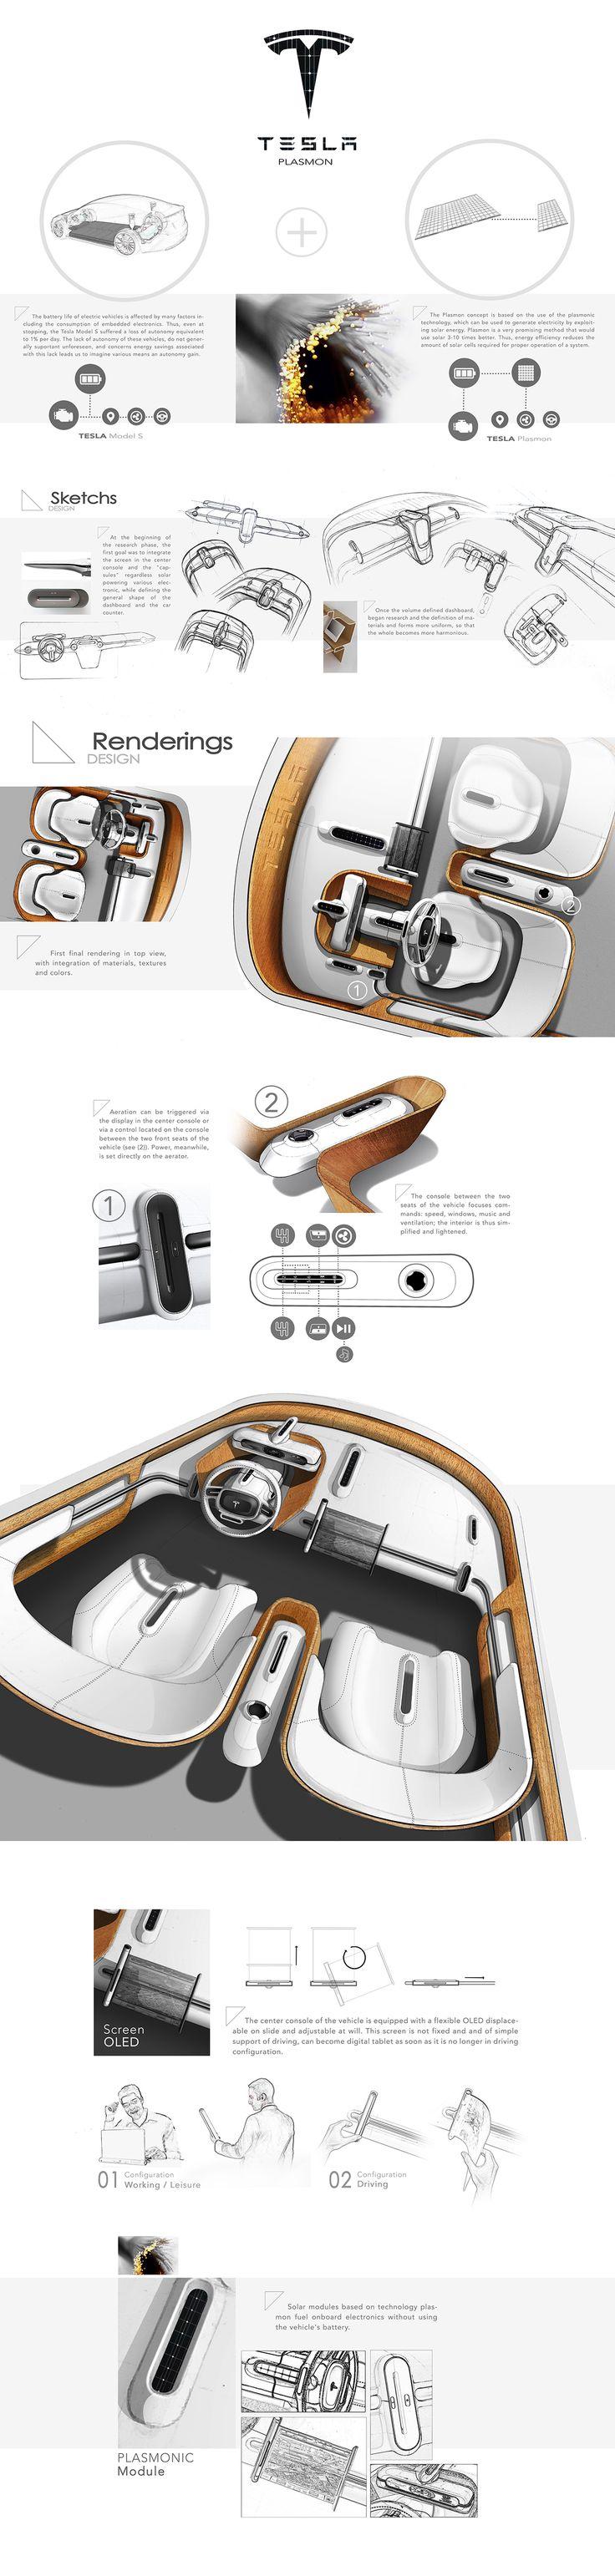 Tesla Plasmon Interior, Short Personal Project on Behance